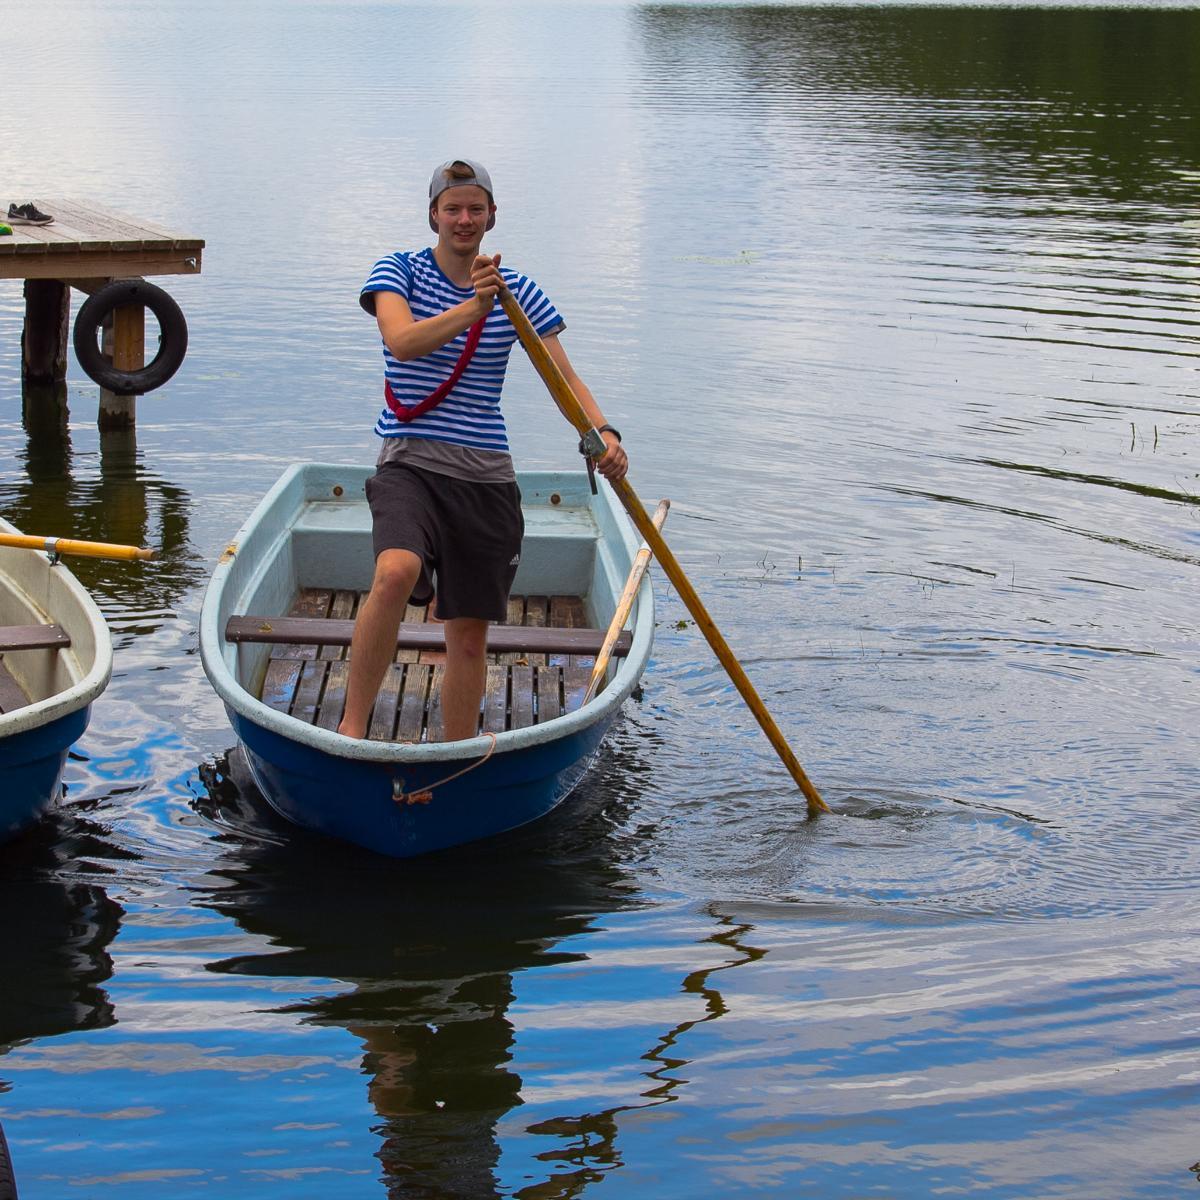 FFZ 2018 - Ruderboot